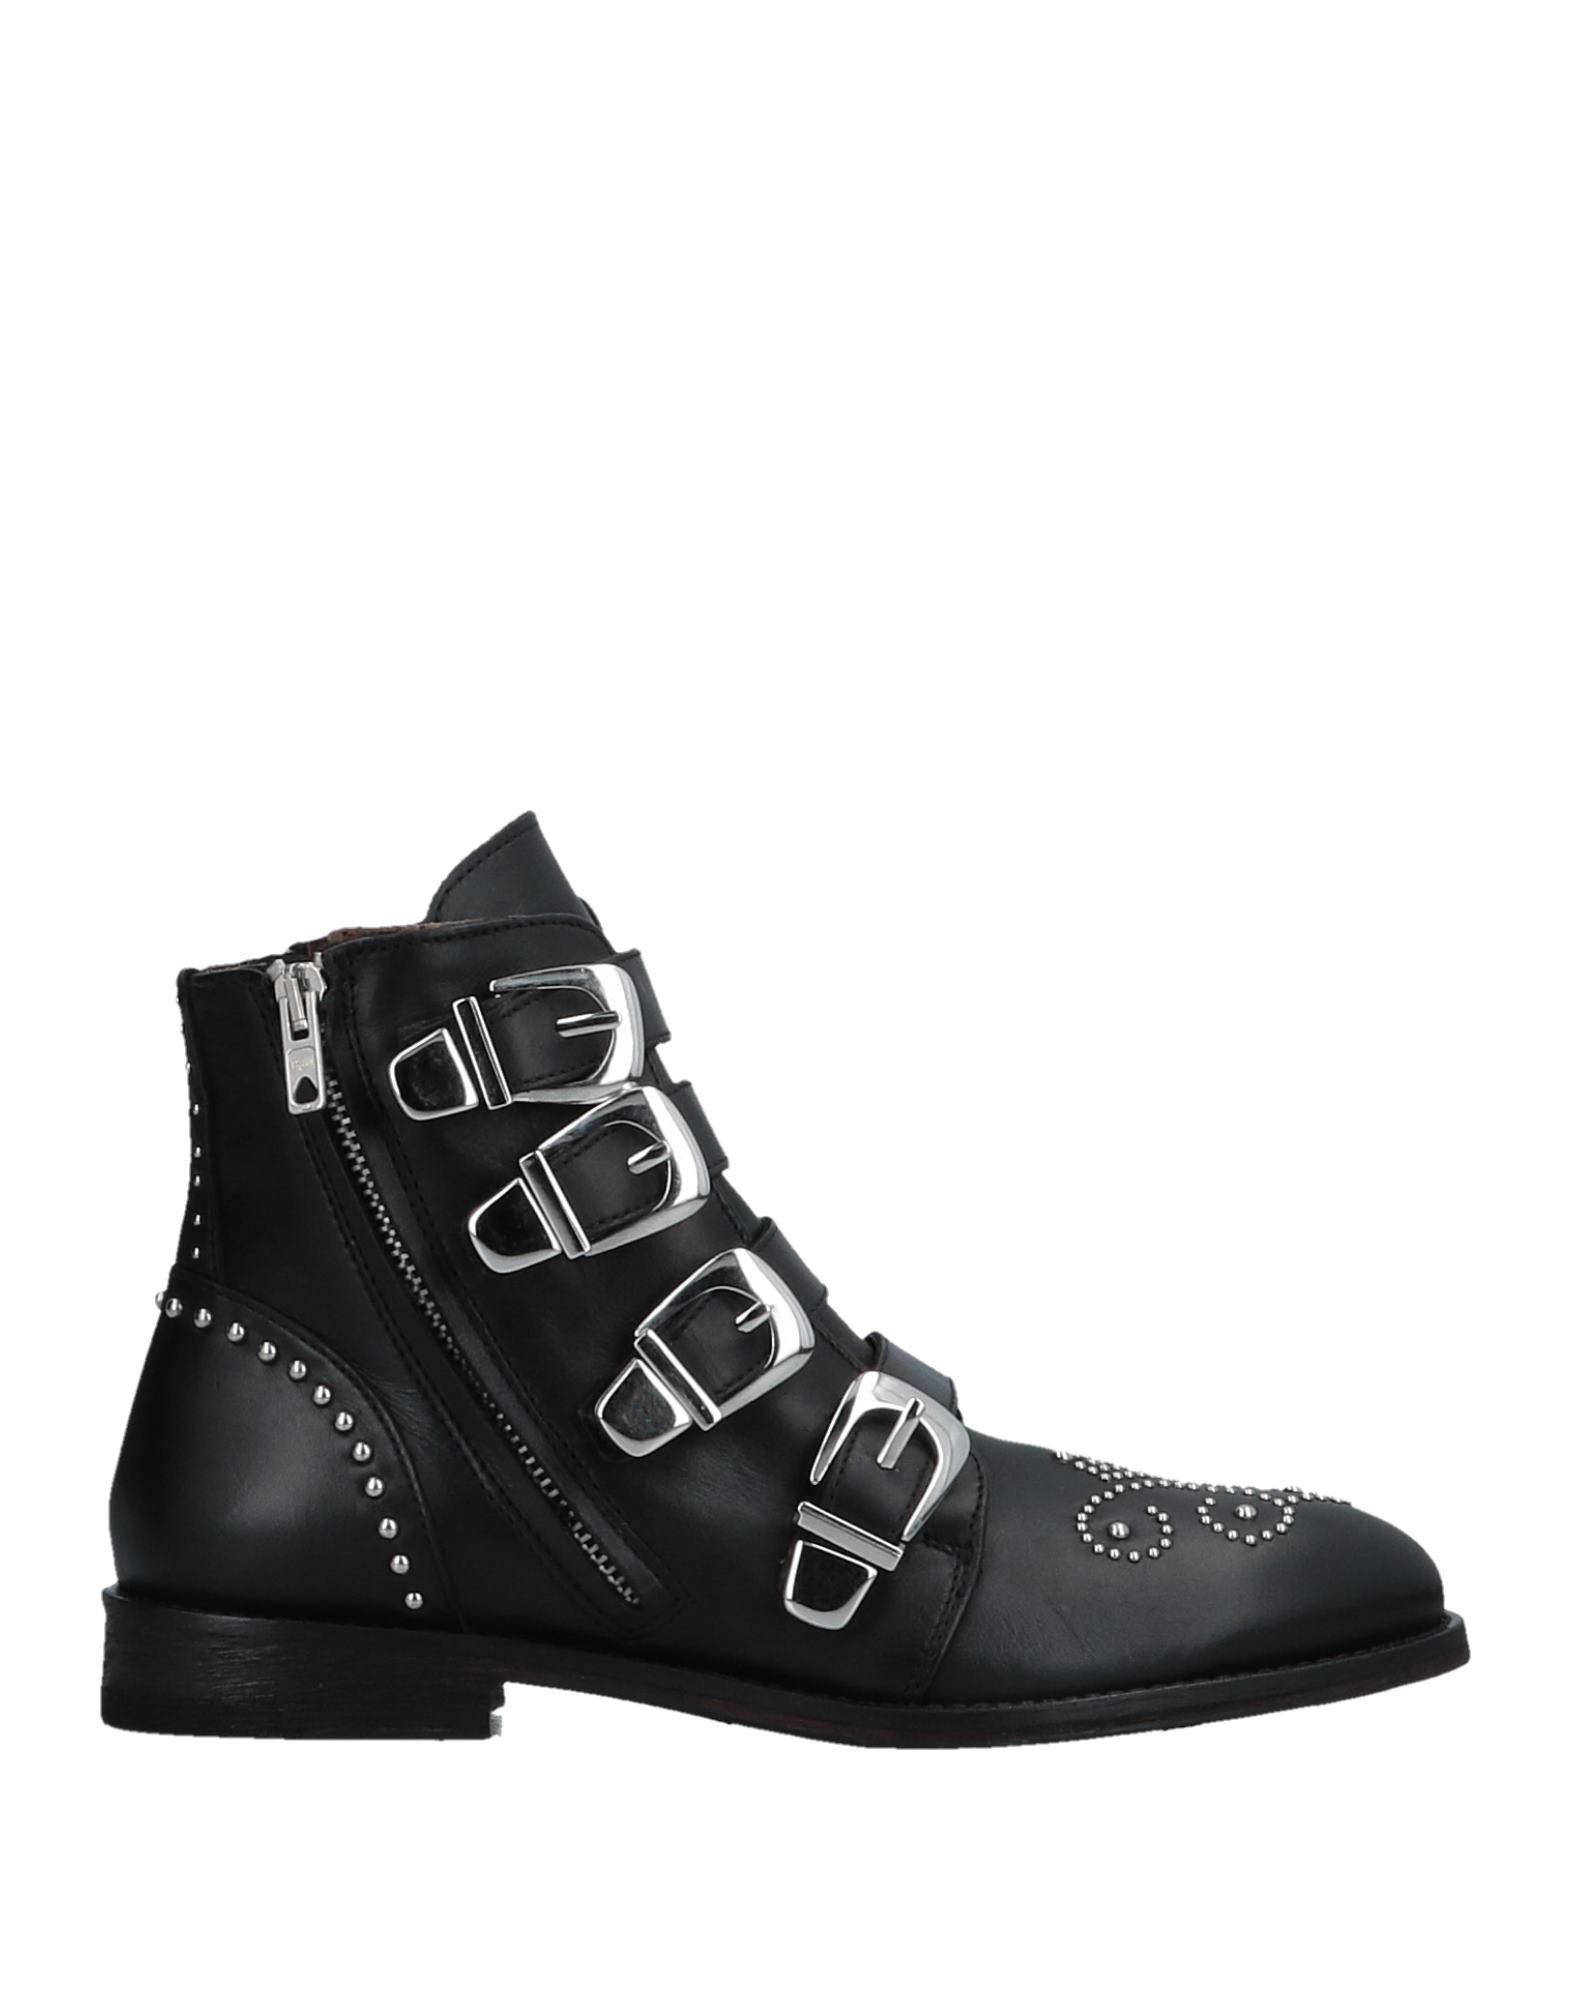 Oscar Conti Stiefelette Damen  11510936HX Gute Qualität beliebte Schuhe